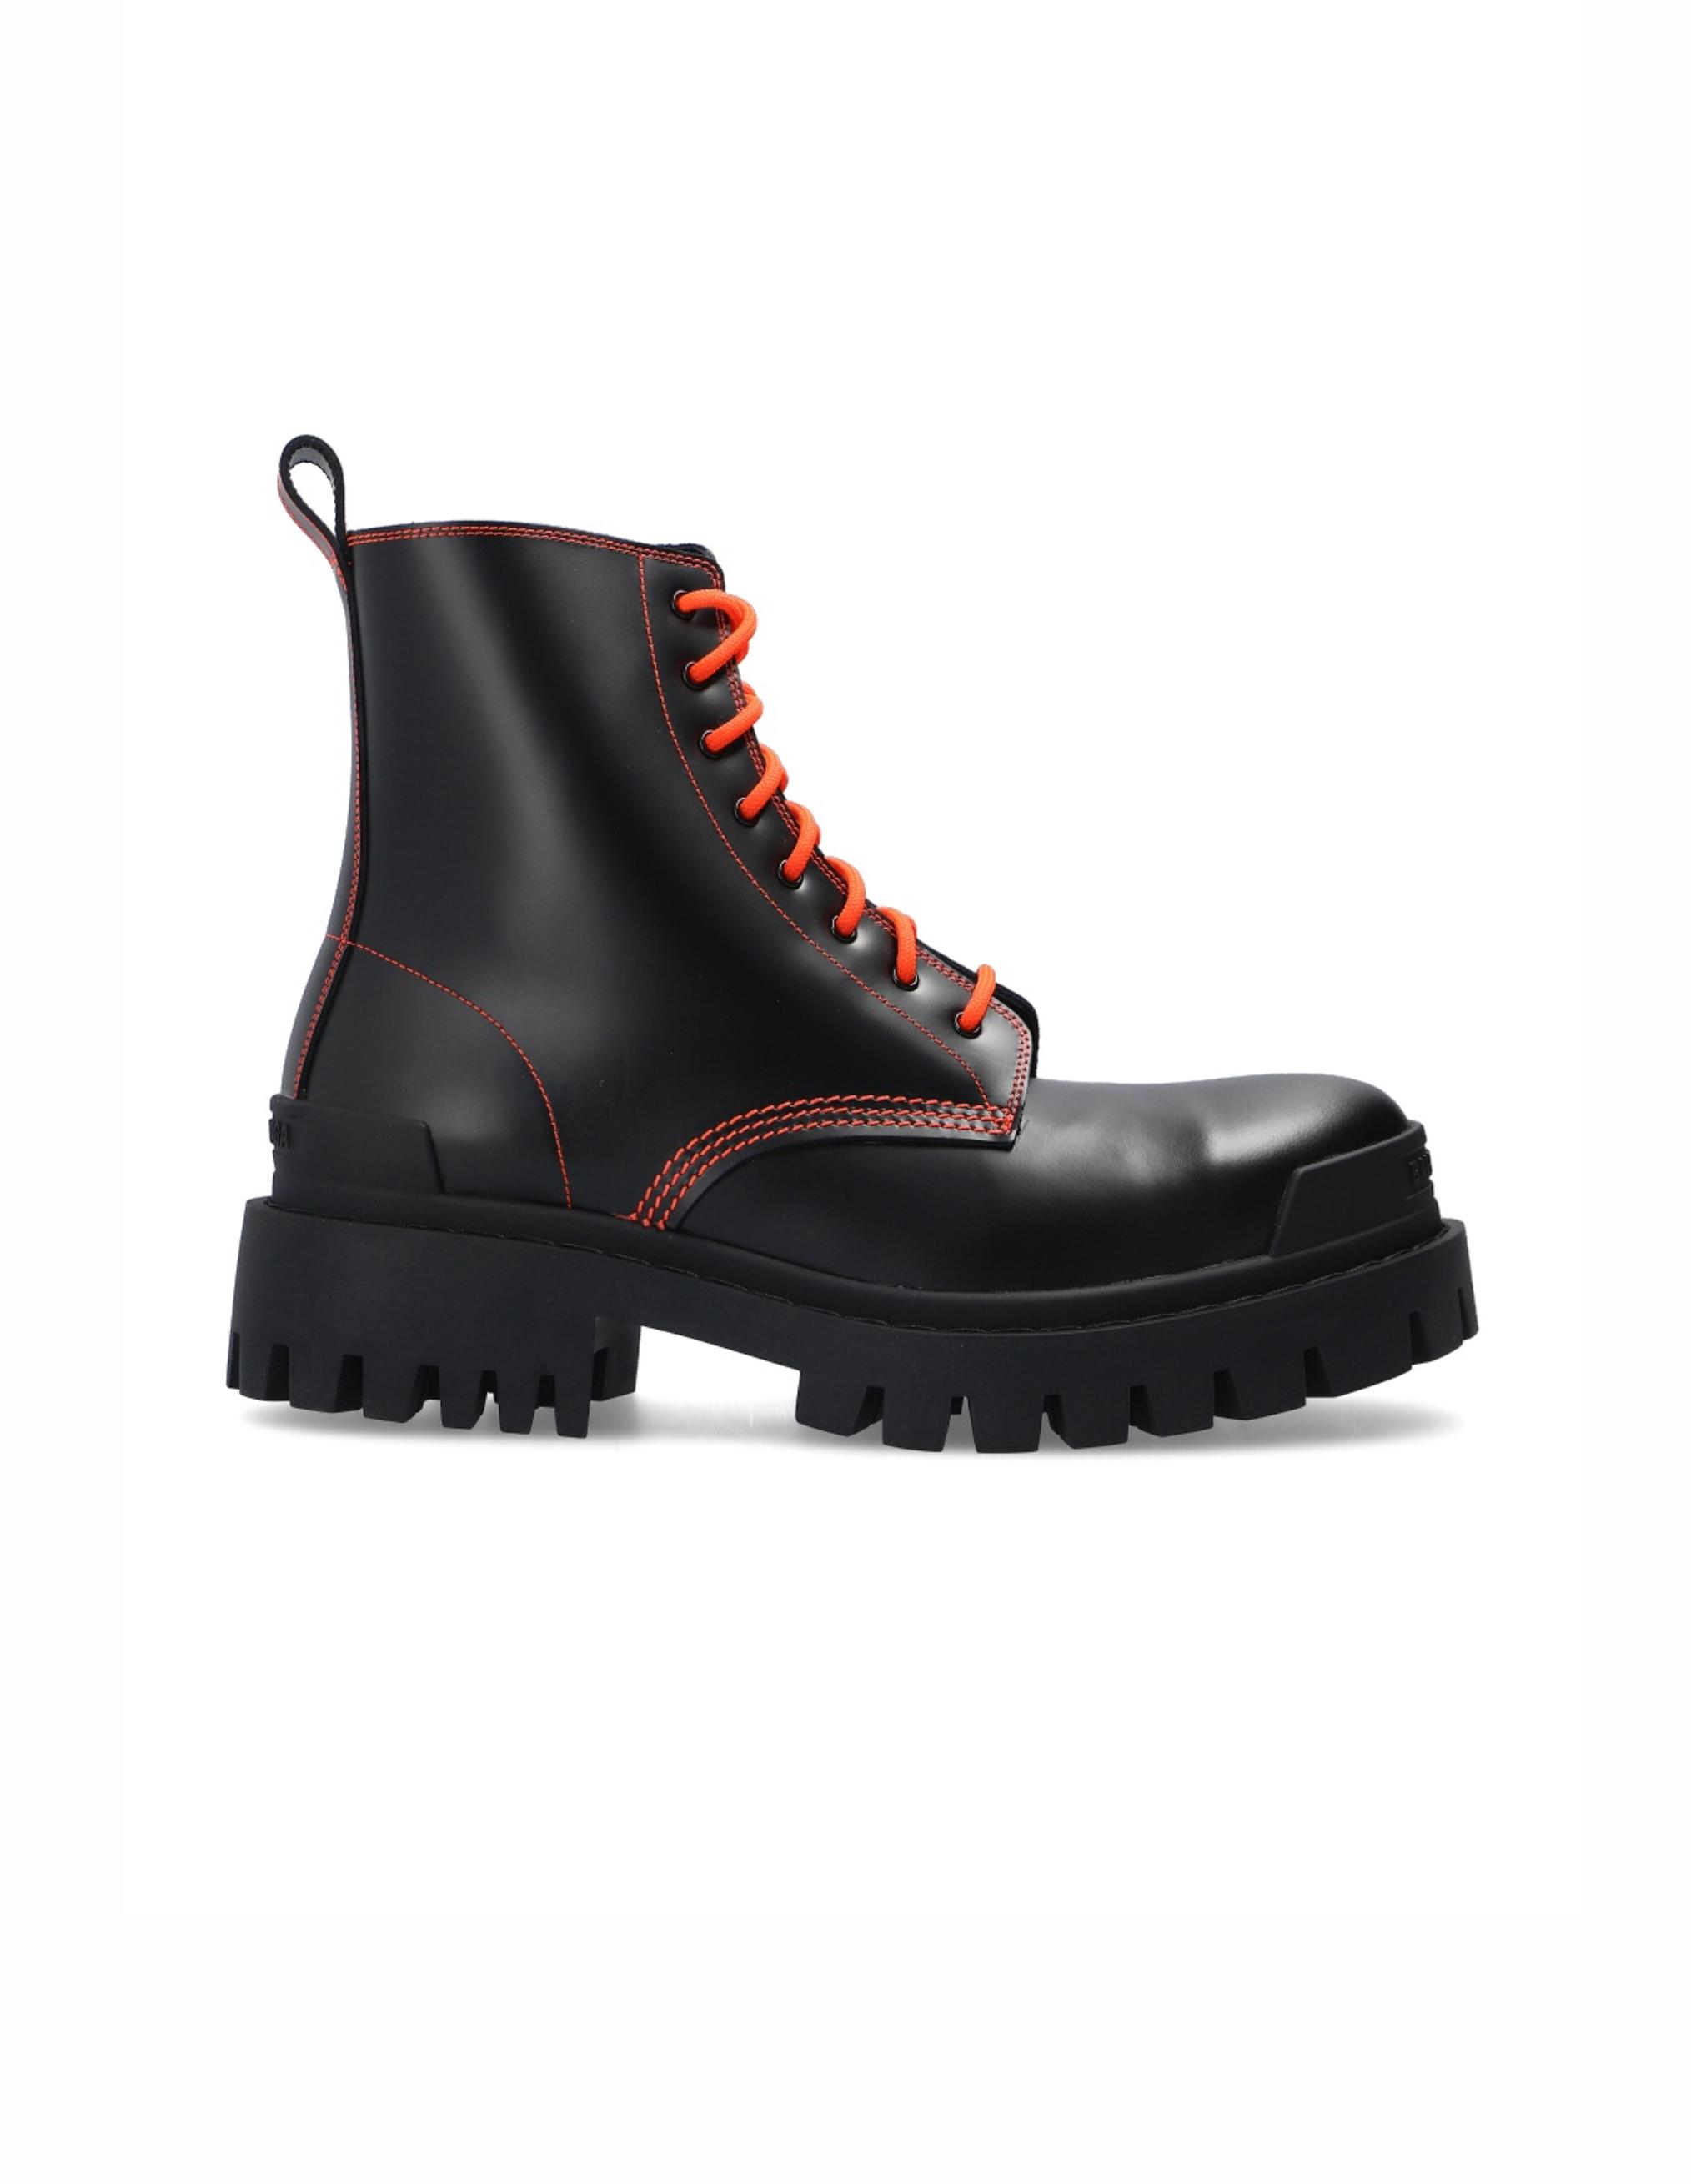 Balenciaga Strike Platform Leather Boots